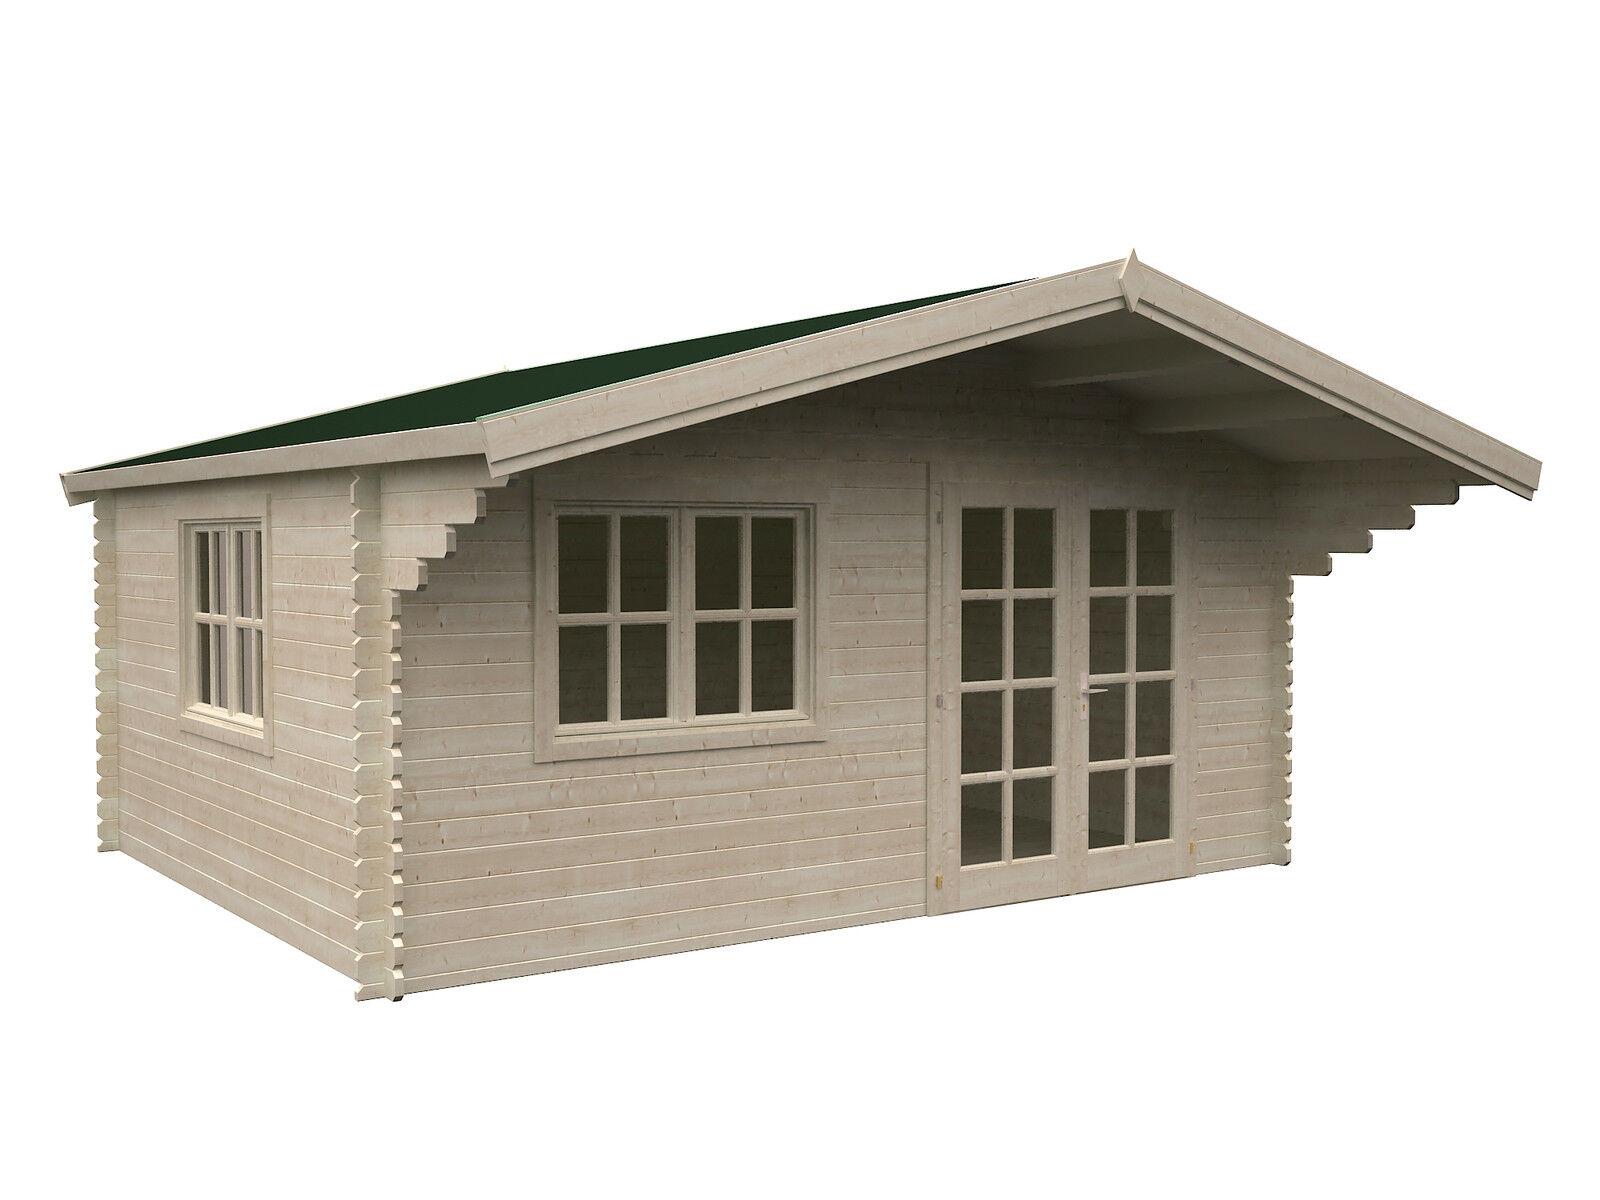 34 mm gartenhaus baily 5 1 ger tehaus blockhaus holz 400x400 cm schleppdach ebay. Black Bedroom Furniture Sets. Home Design Ideas